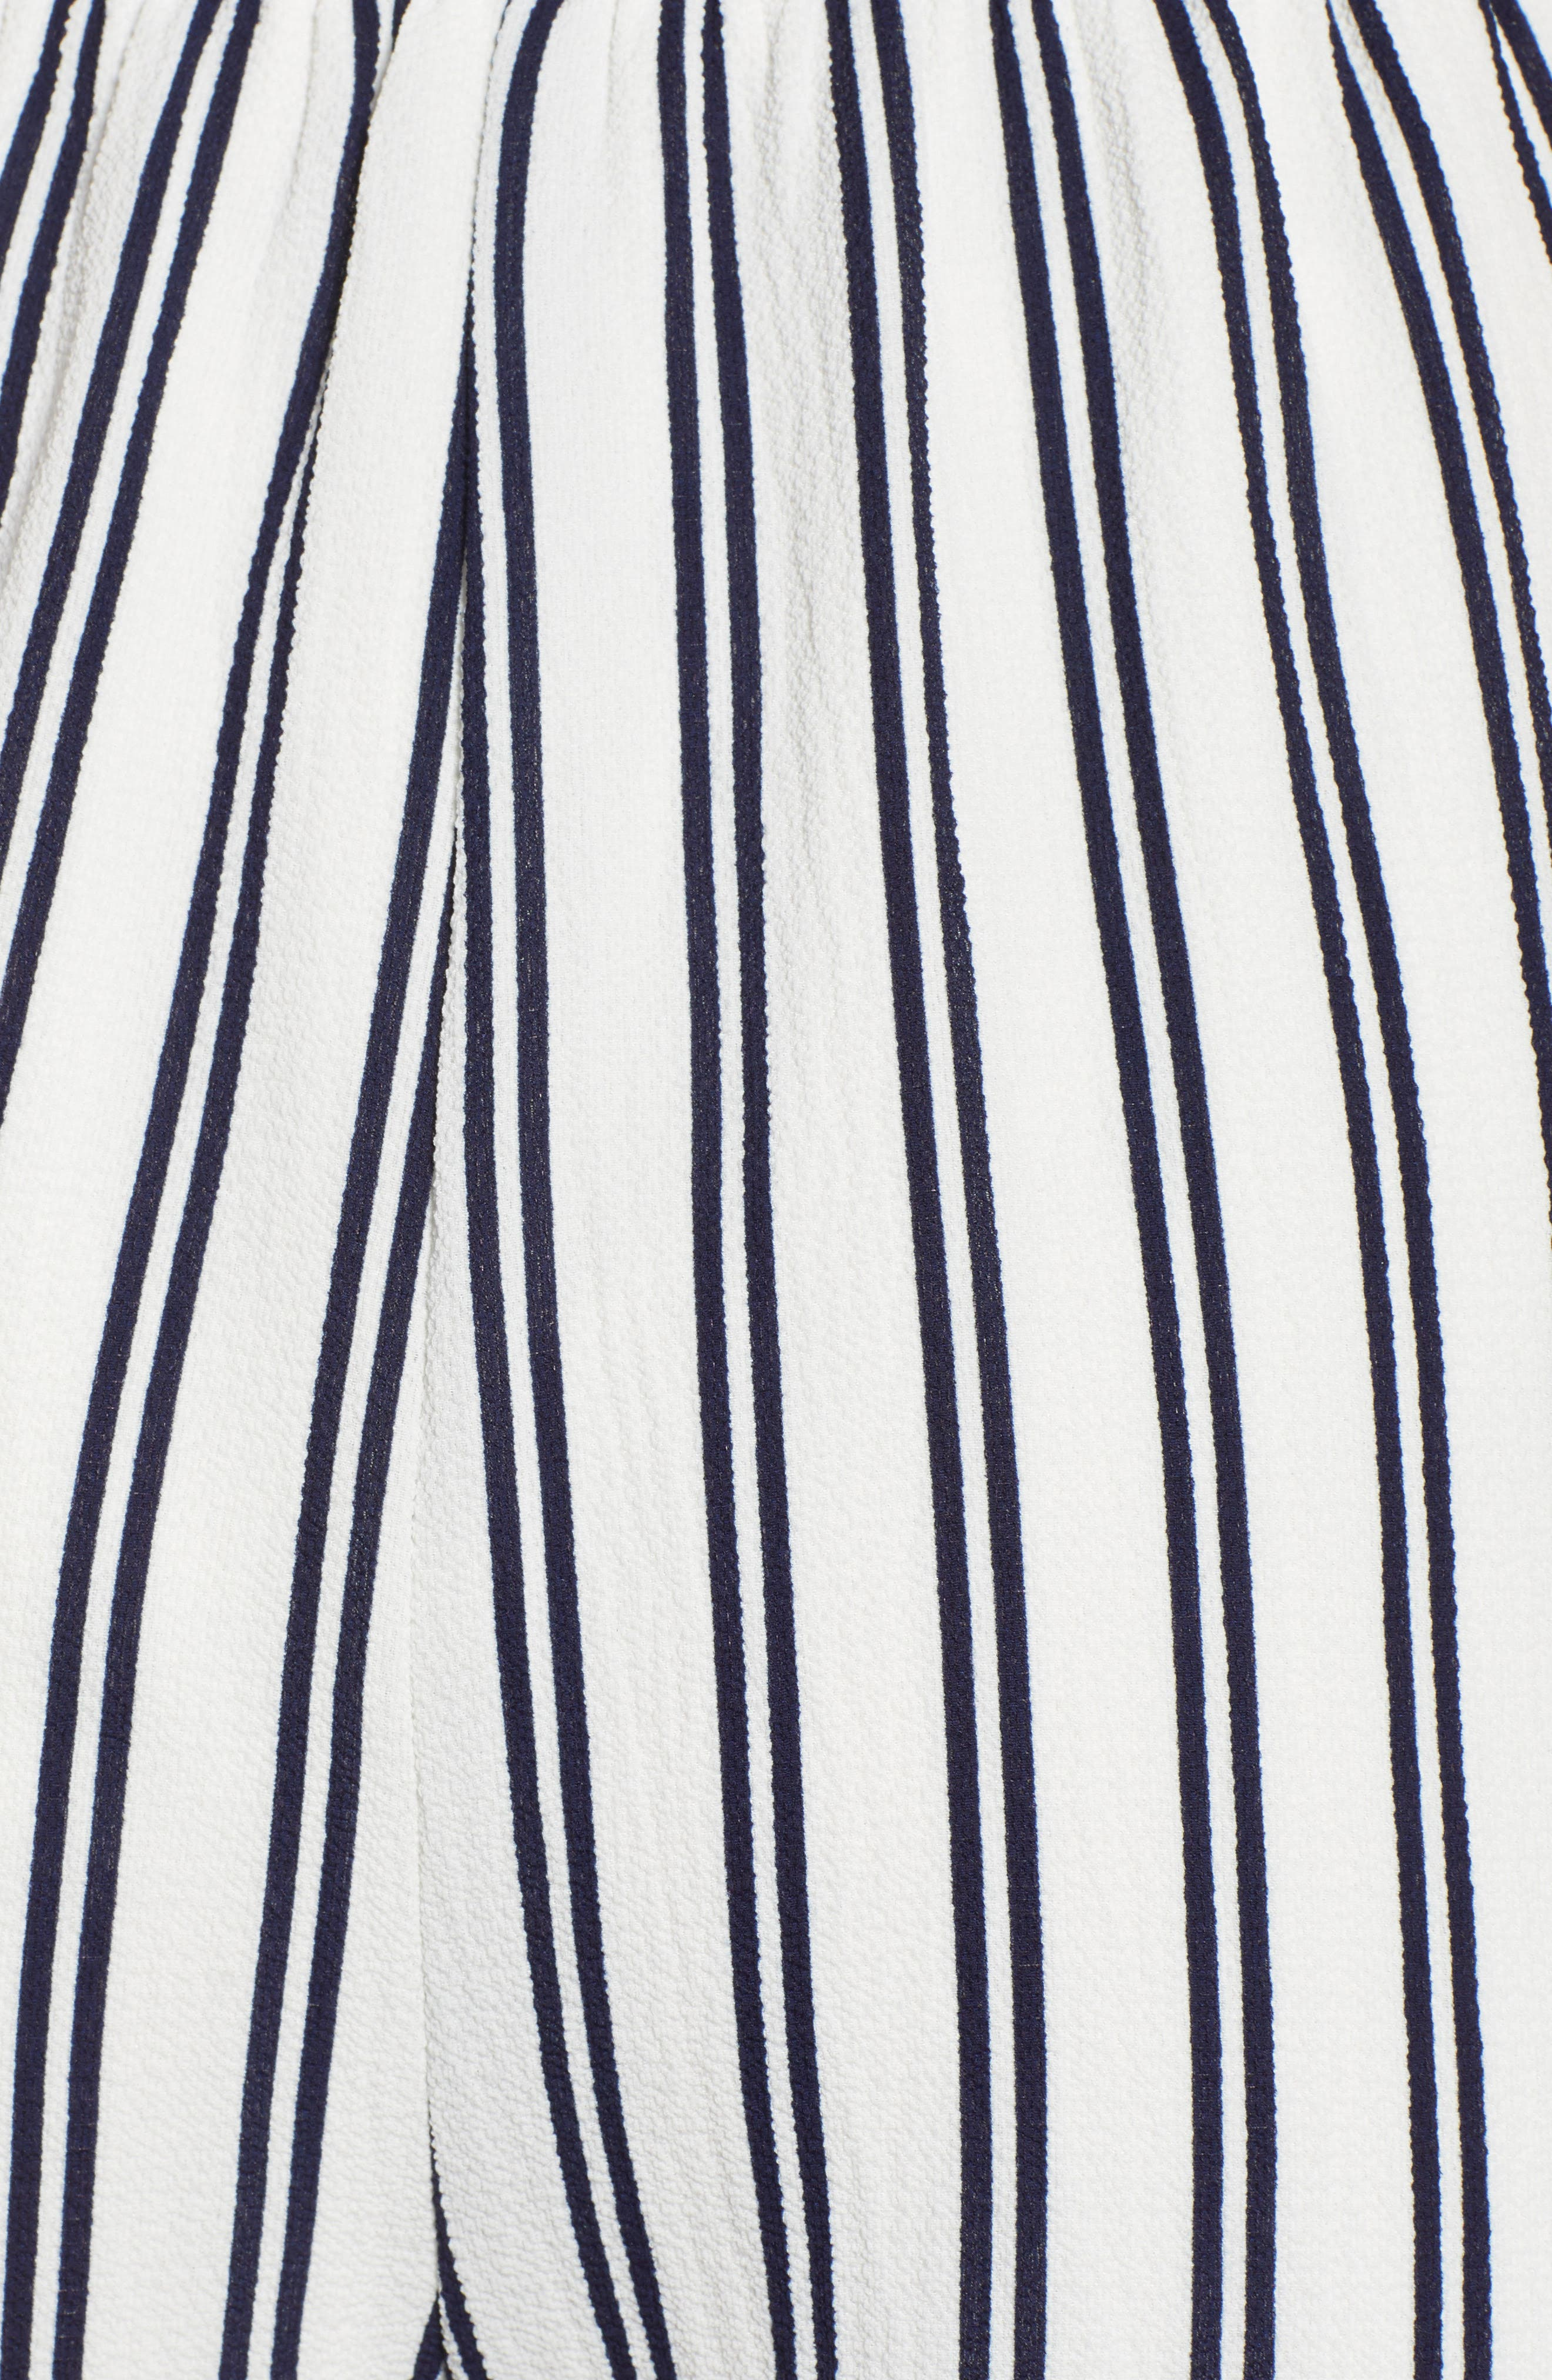 Stripe Off the Shoulder Romper,                             Alternate thumbnail 6, color,                             Navy/ Ivory Stripe